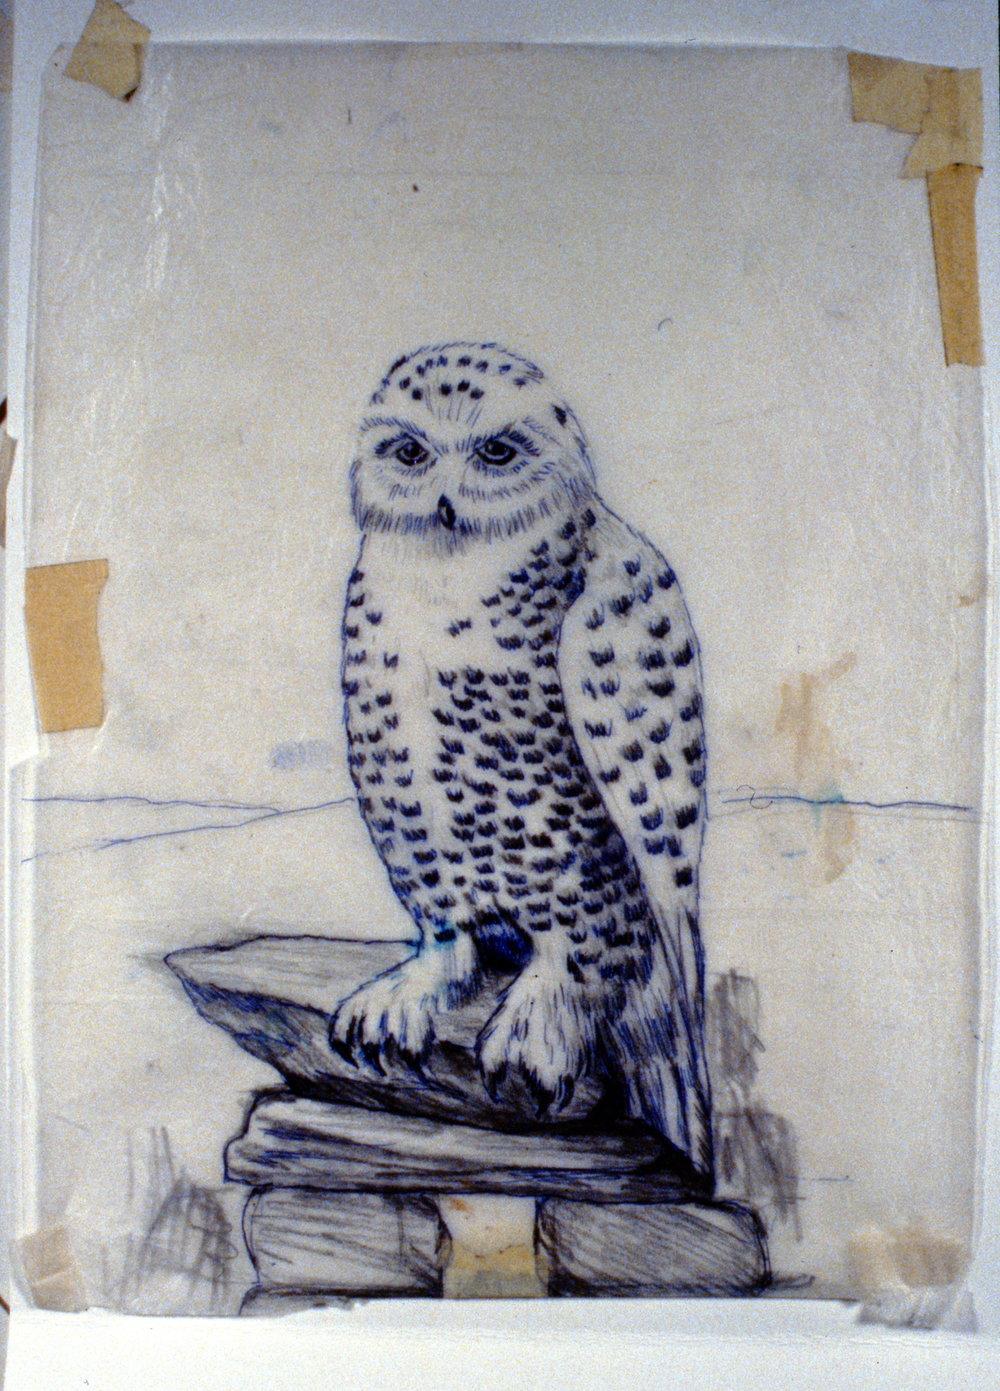 Snowy Owl, 1992, Minn Sjløseth, sketch, 27.5 x 21cm, 1996.02.04